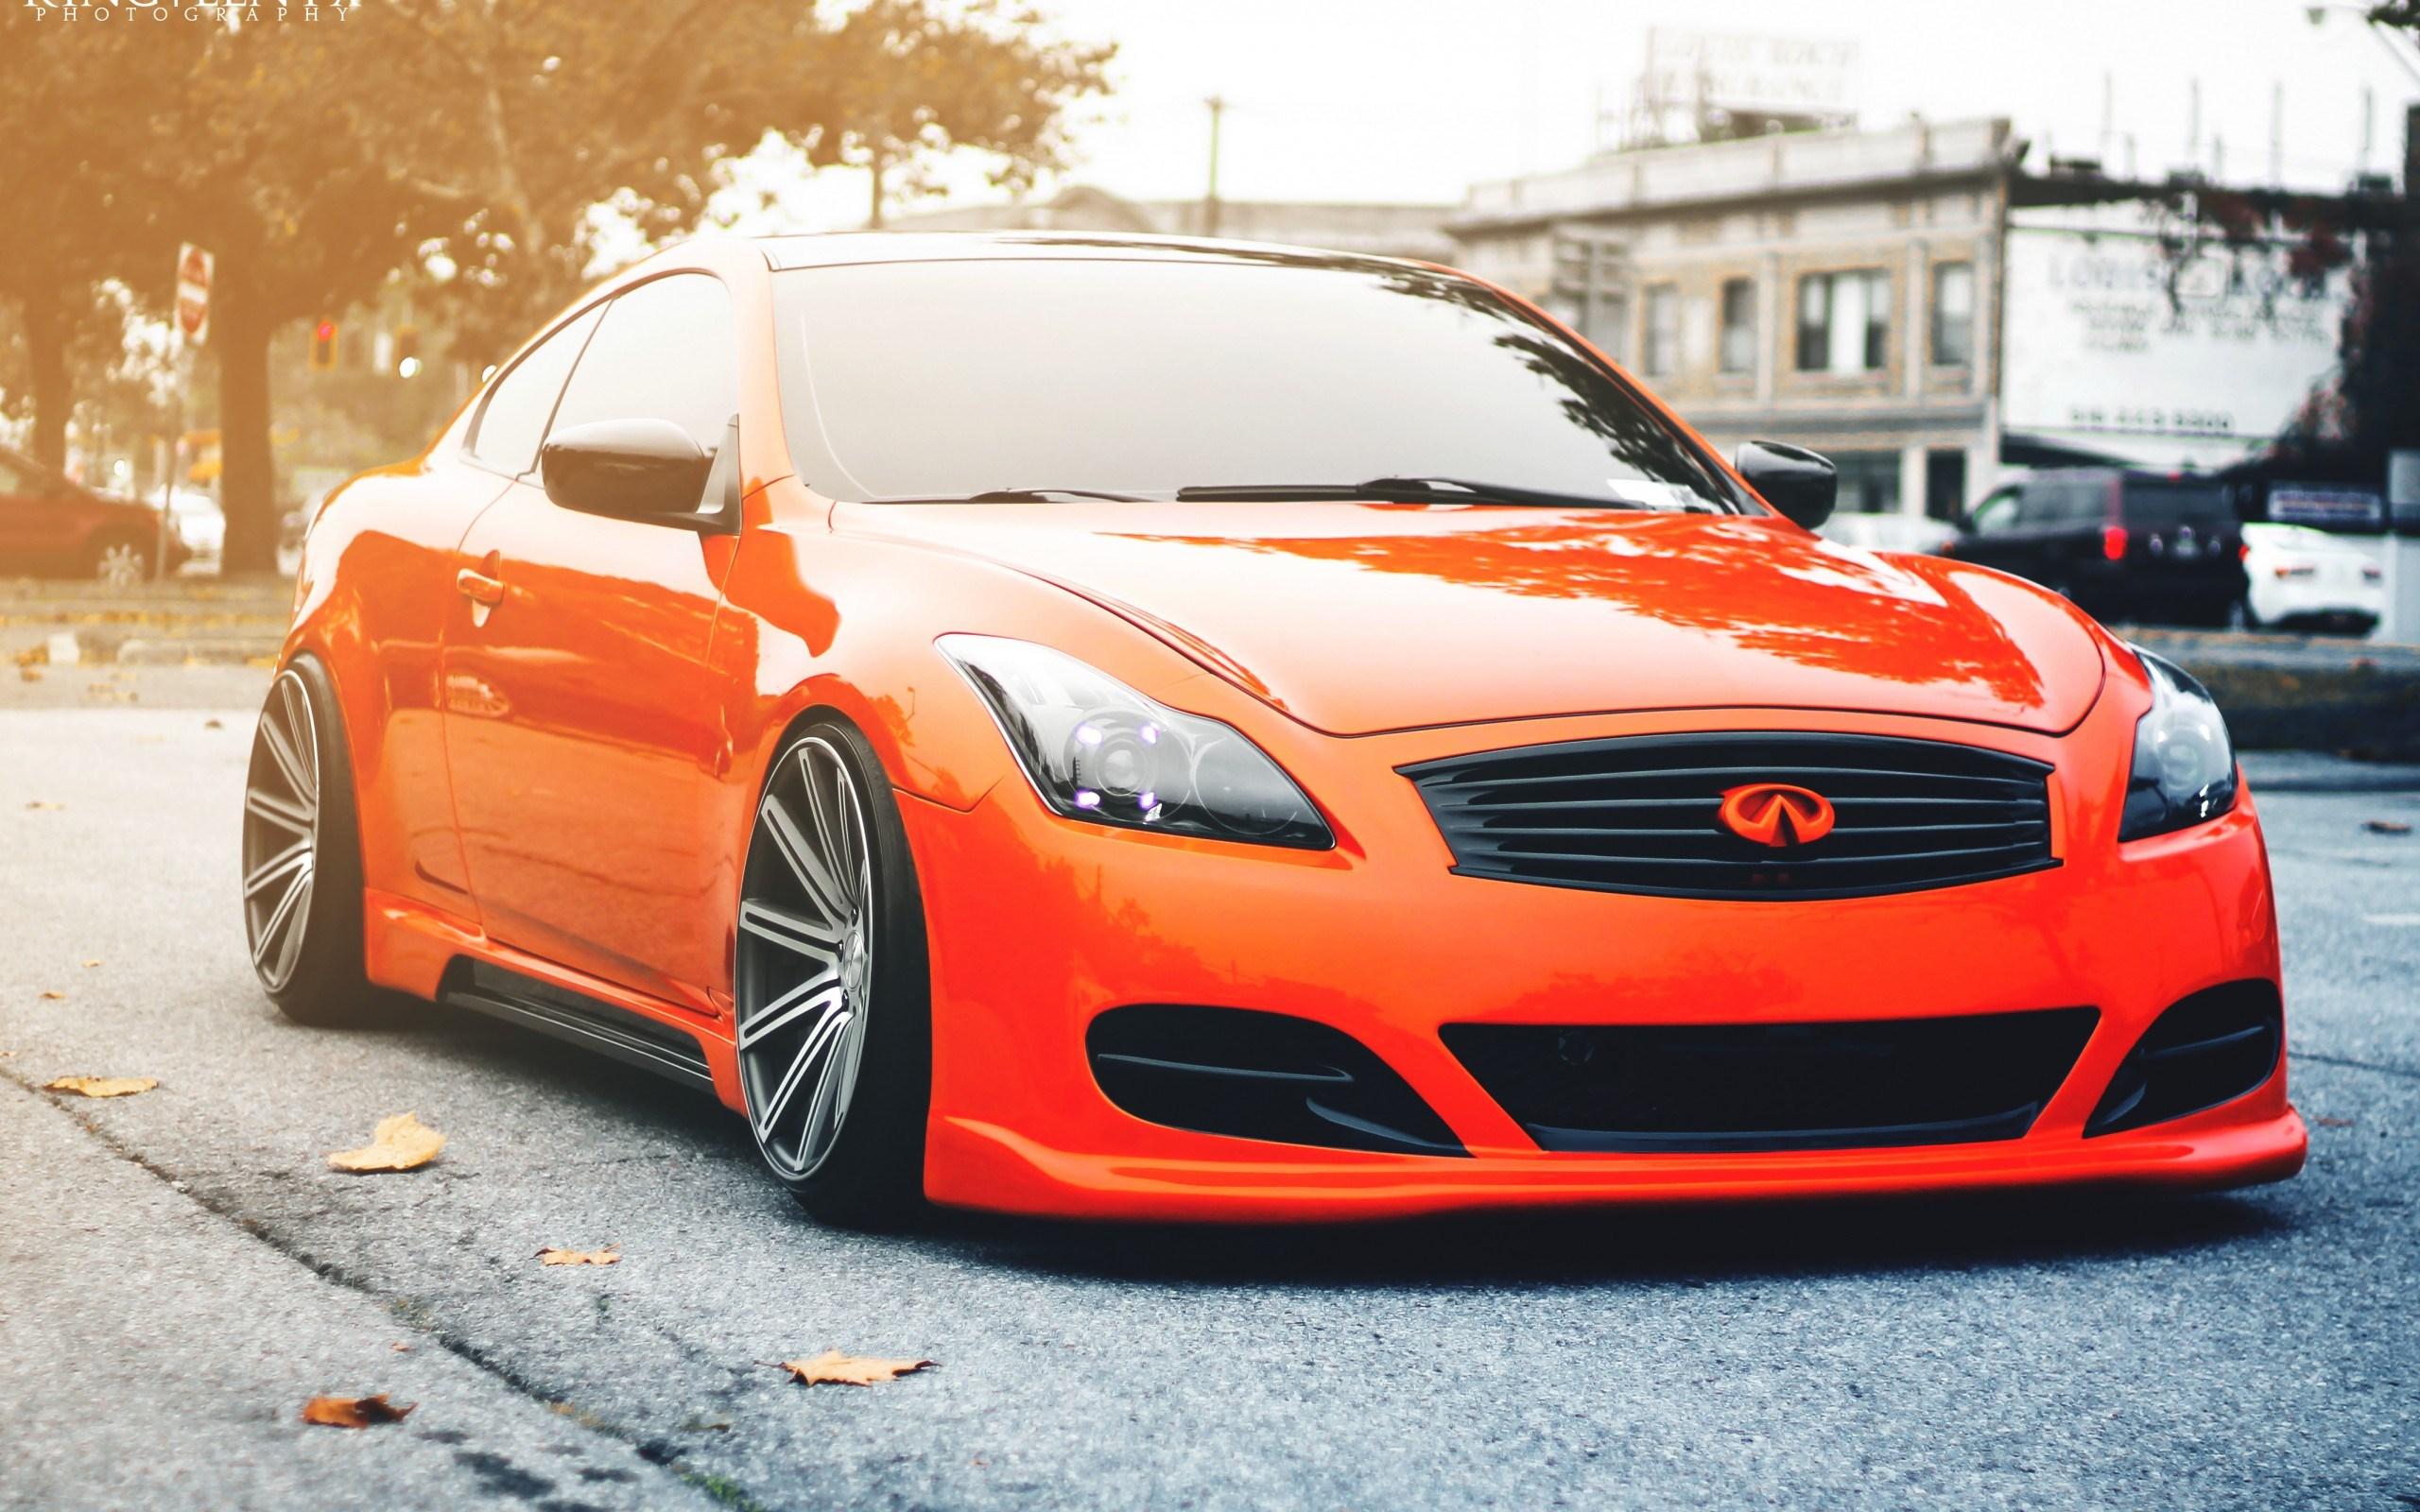 Infiniti G35 Orange Tuning Car